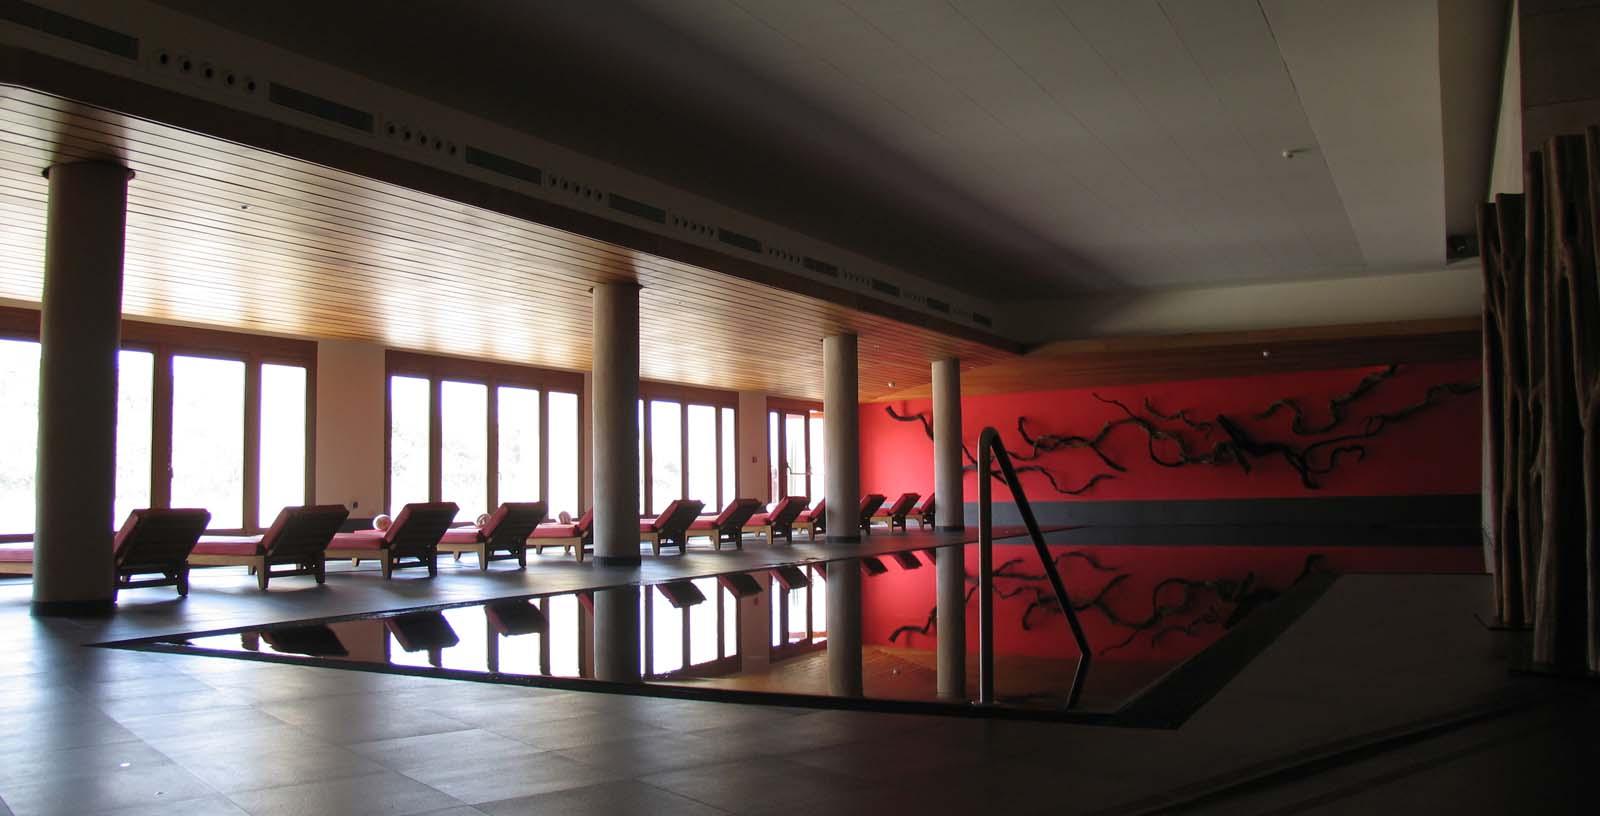 Marques_de_Riscal_hotel_07_Building_Idom_Idom